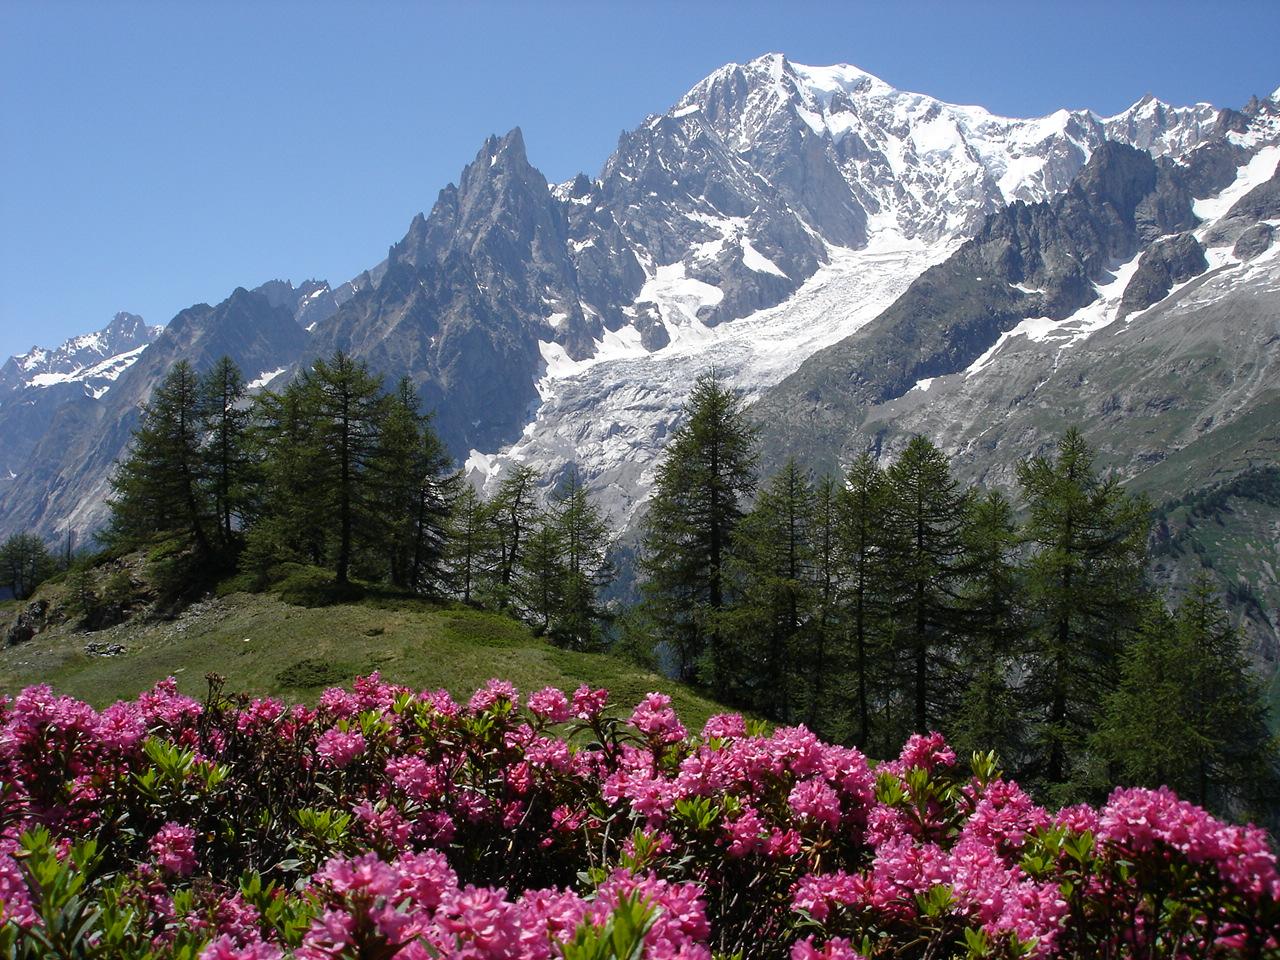 Agriturismi in Valle d'Aosta